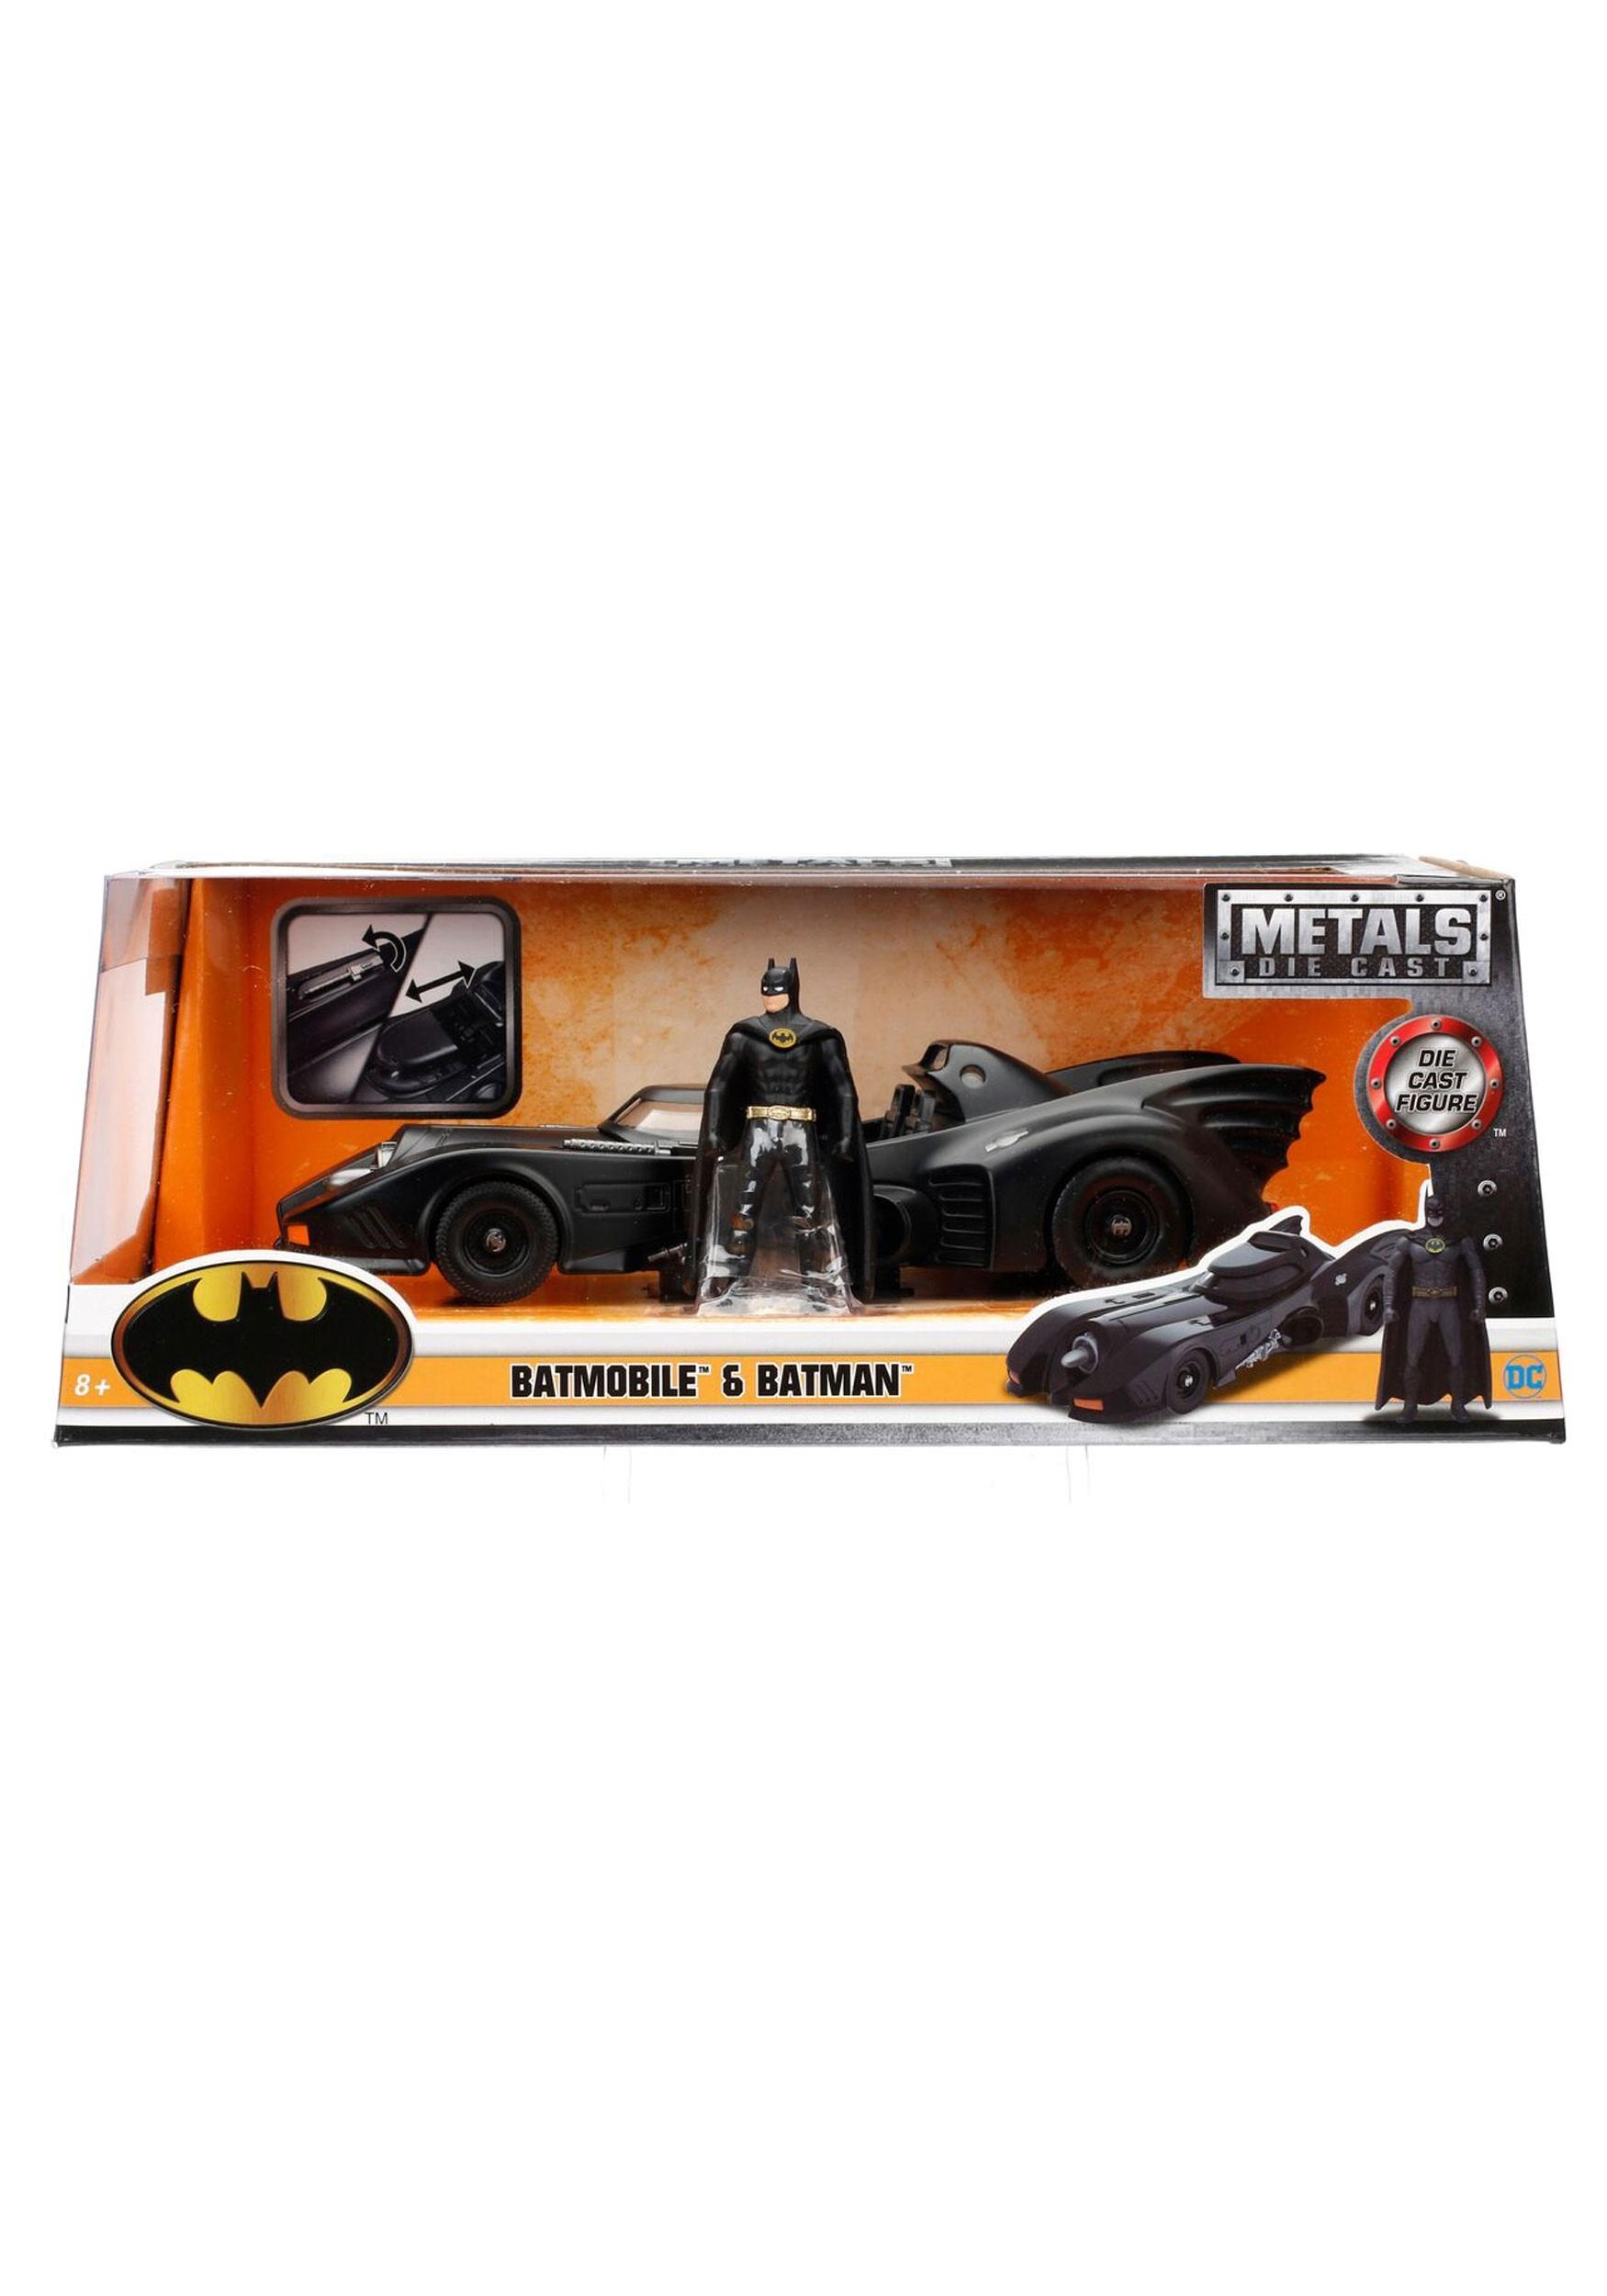 1989 Batmobile Batman 1:24 Scale Model with Figure